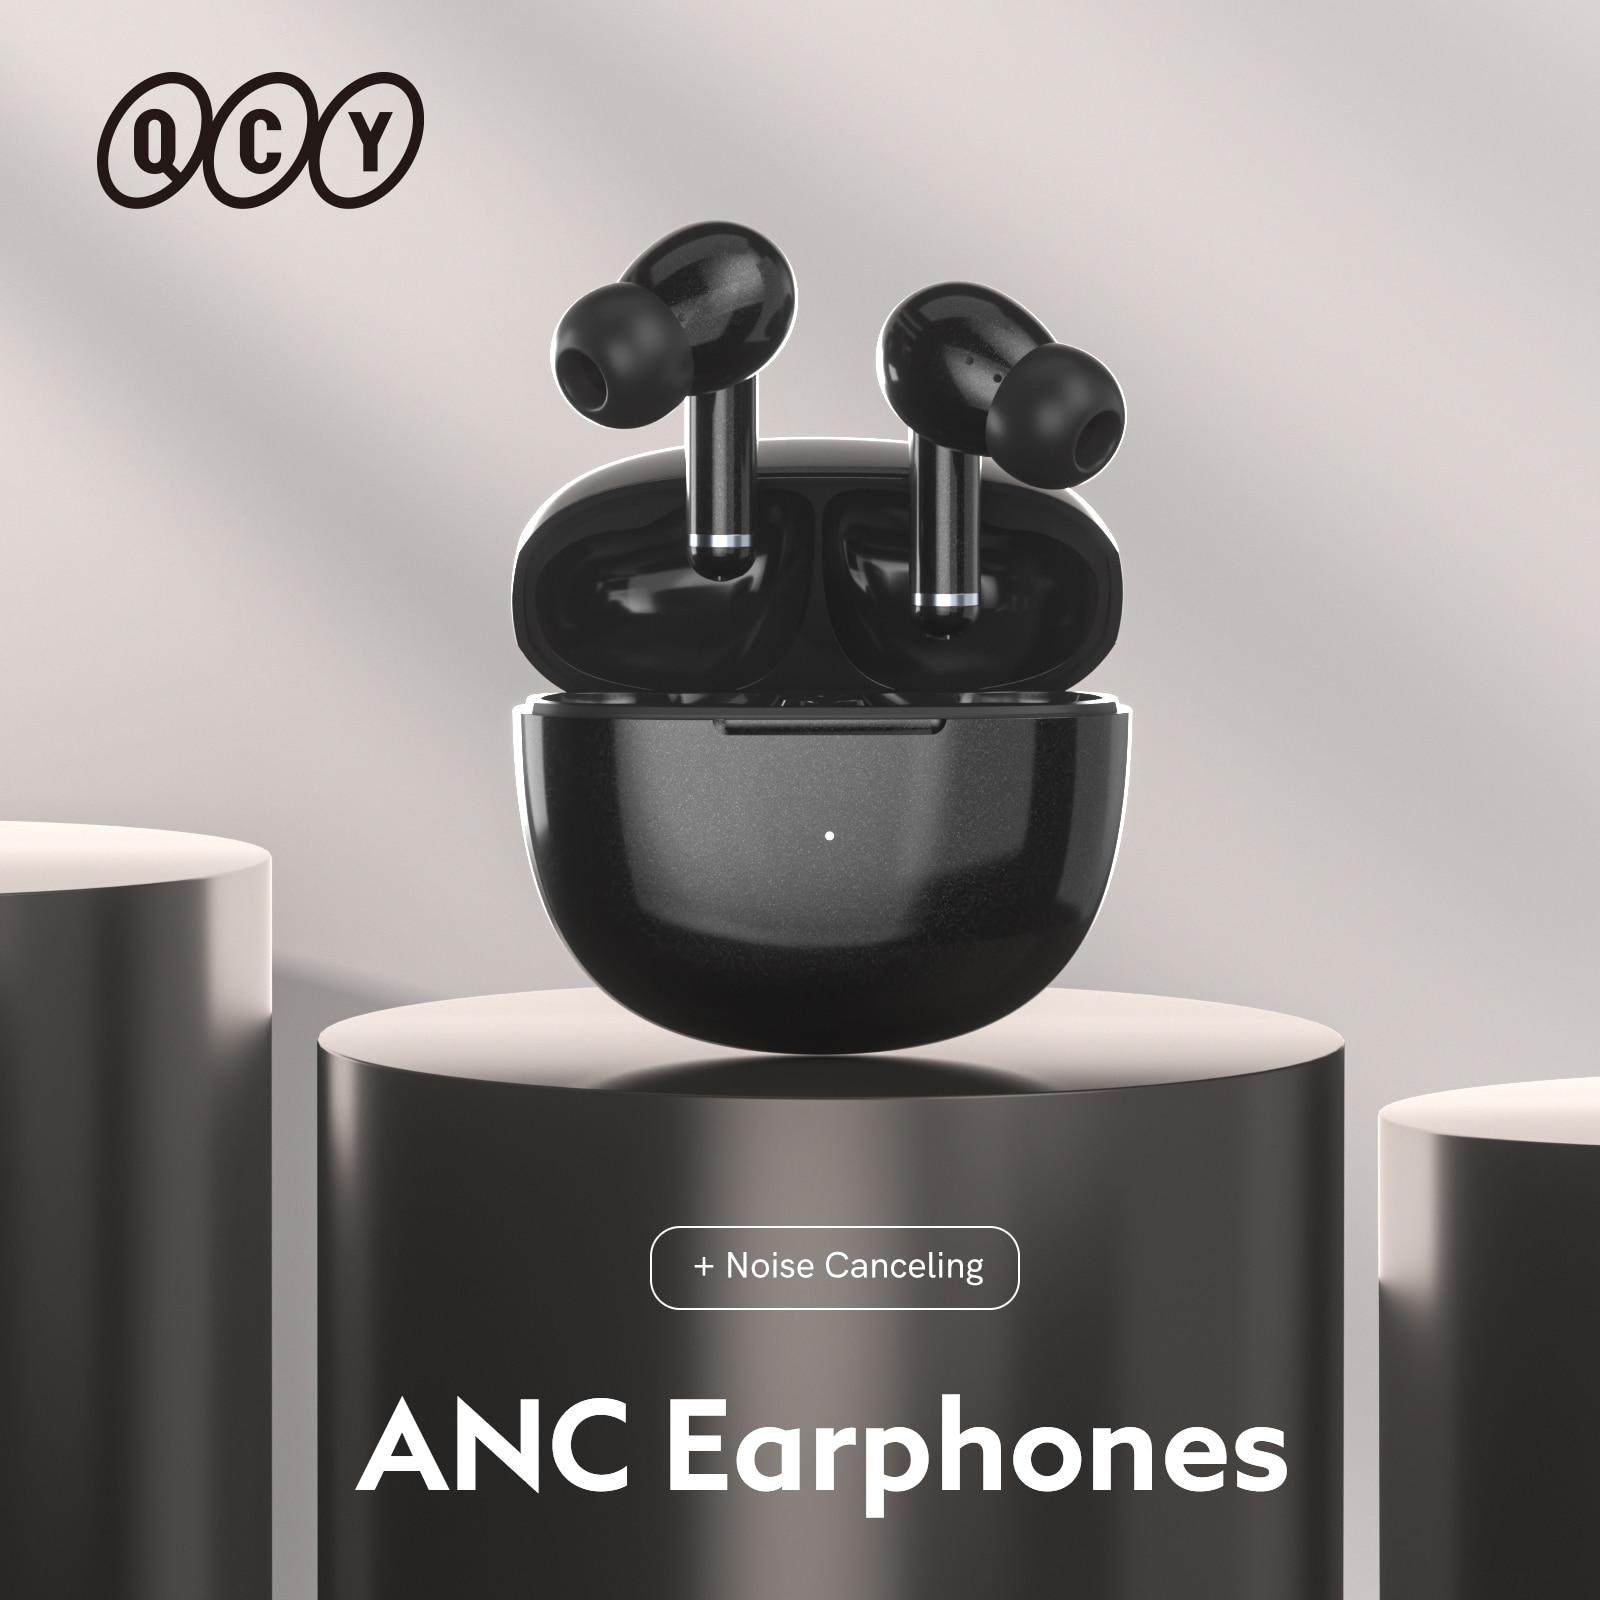 QCY HT03 TWS ANC Fone سماعات بلوتوث إلغاء الضوضاء سماعات لاسلكية الألعاب سماعة مزودة بميكروفون سماعة أذن حر اليدين